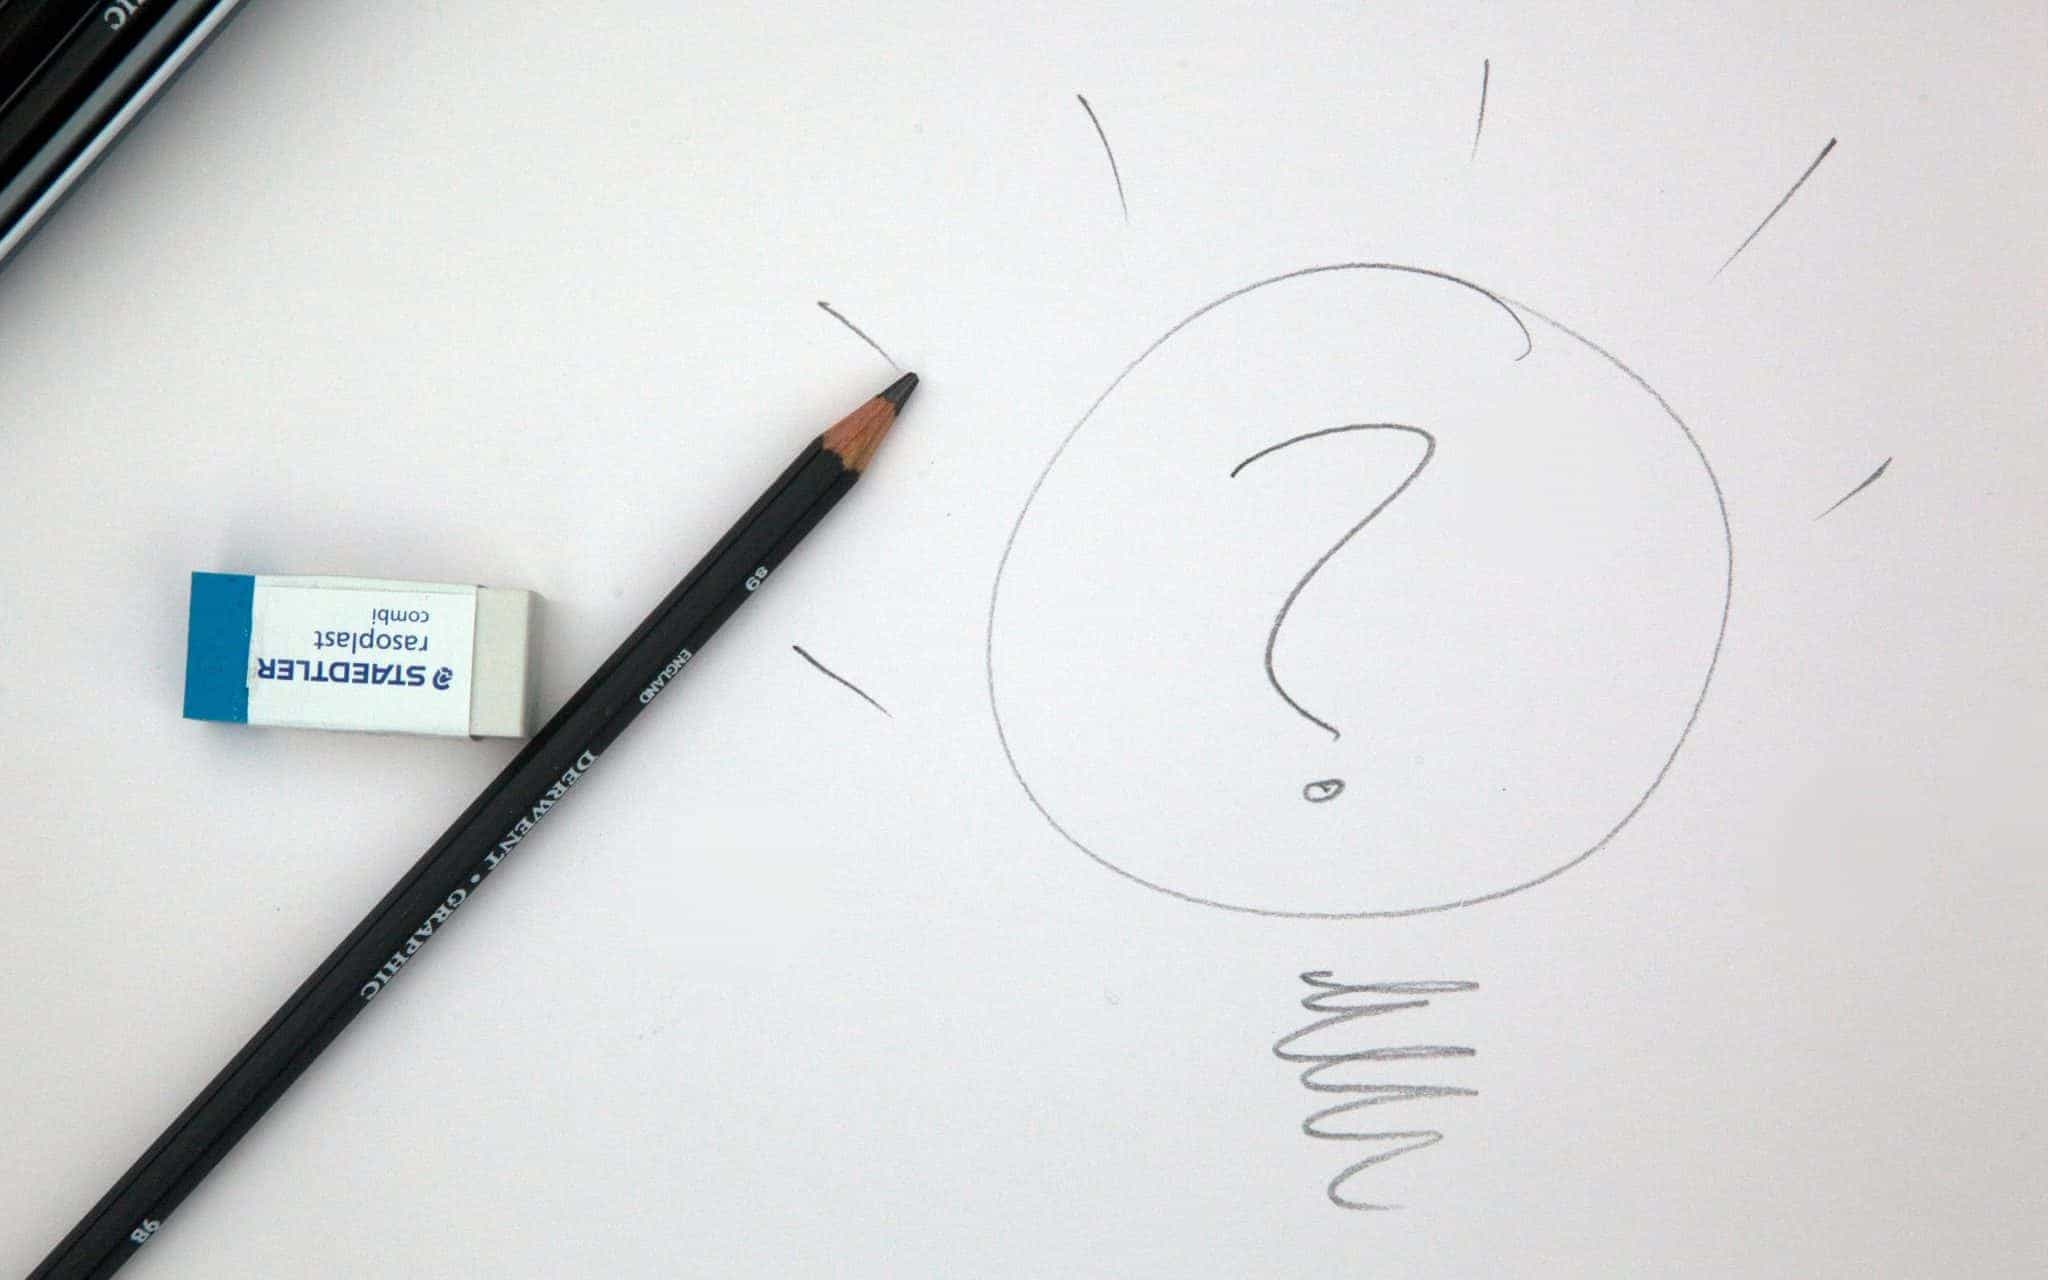 Kreativitätstechniken: vom leeren Blatt zur innovativen Idee